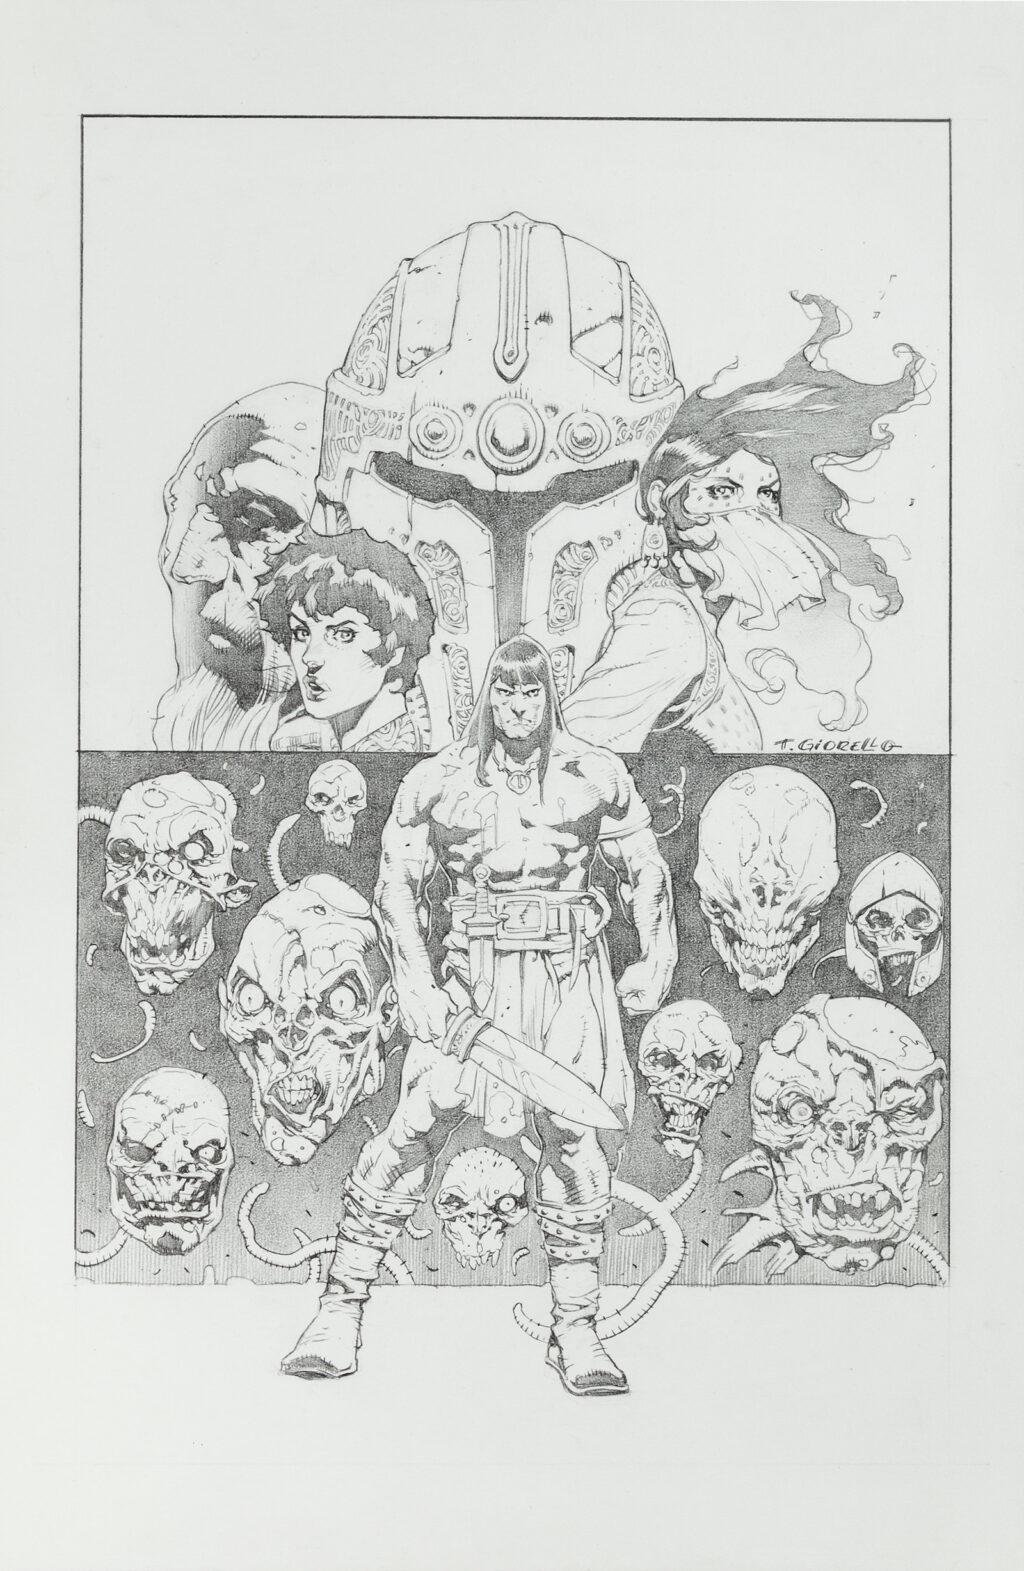 Conan issue 47 cover by Tomas Giorello